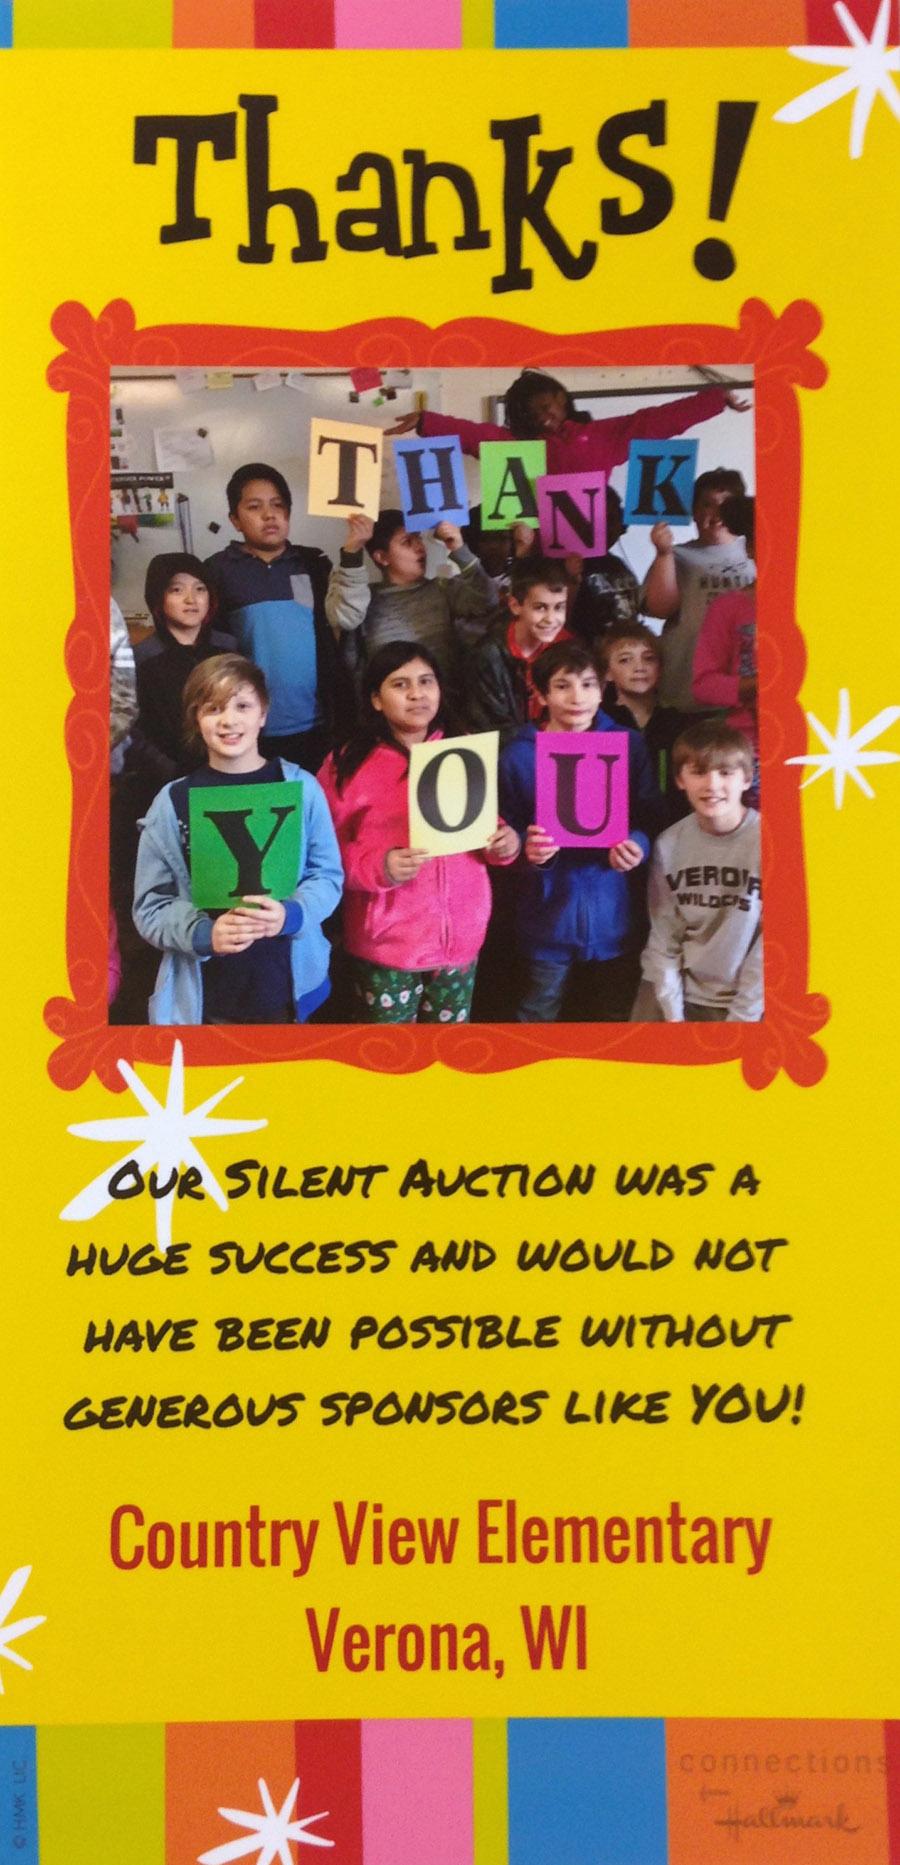 Thanks Country View Elementary School Verona